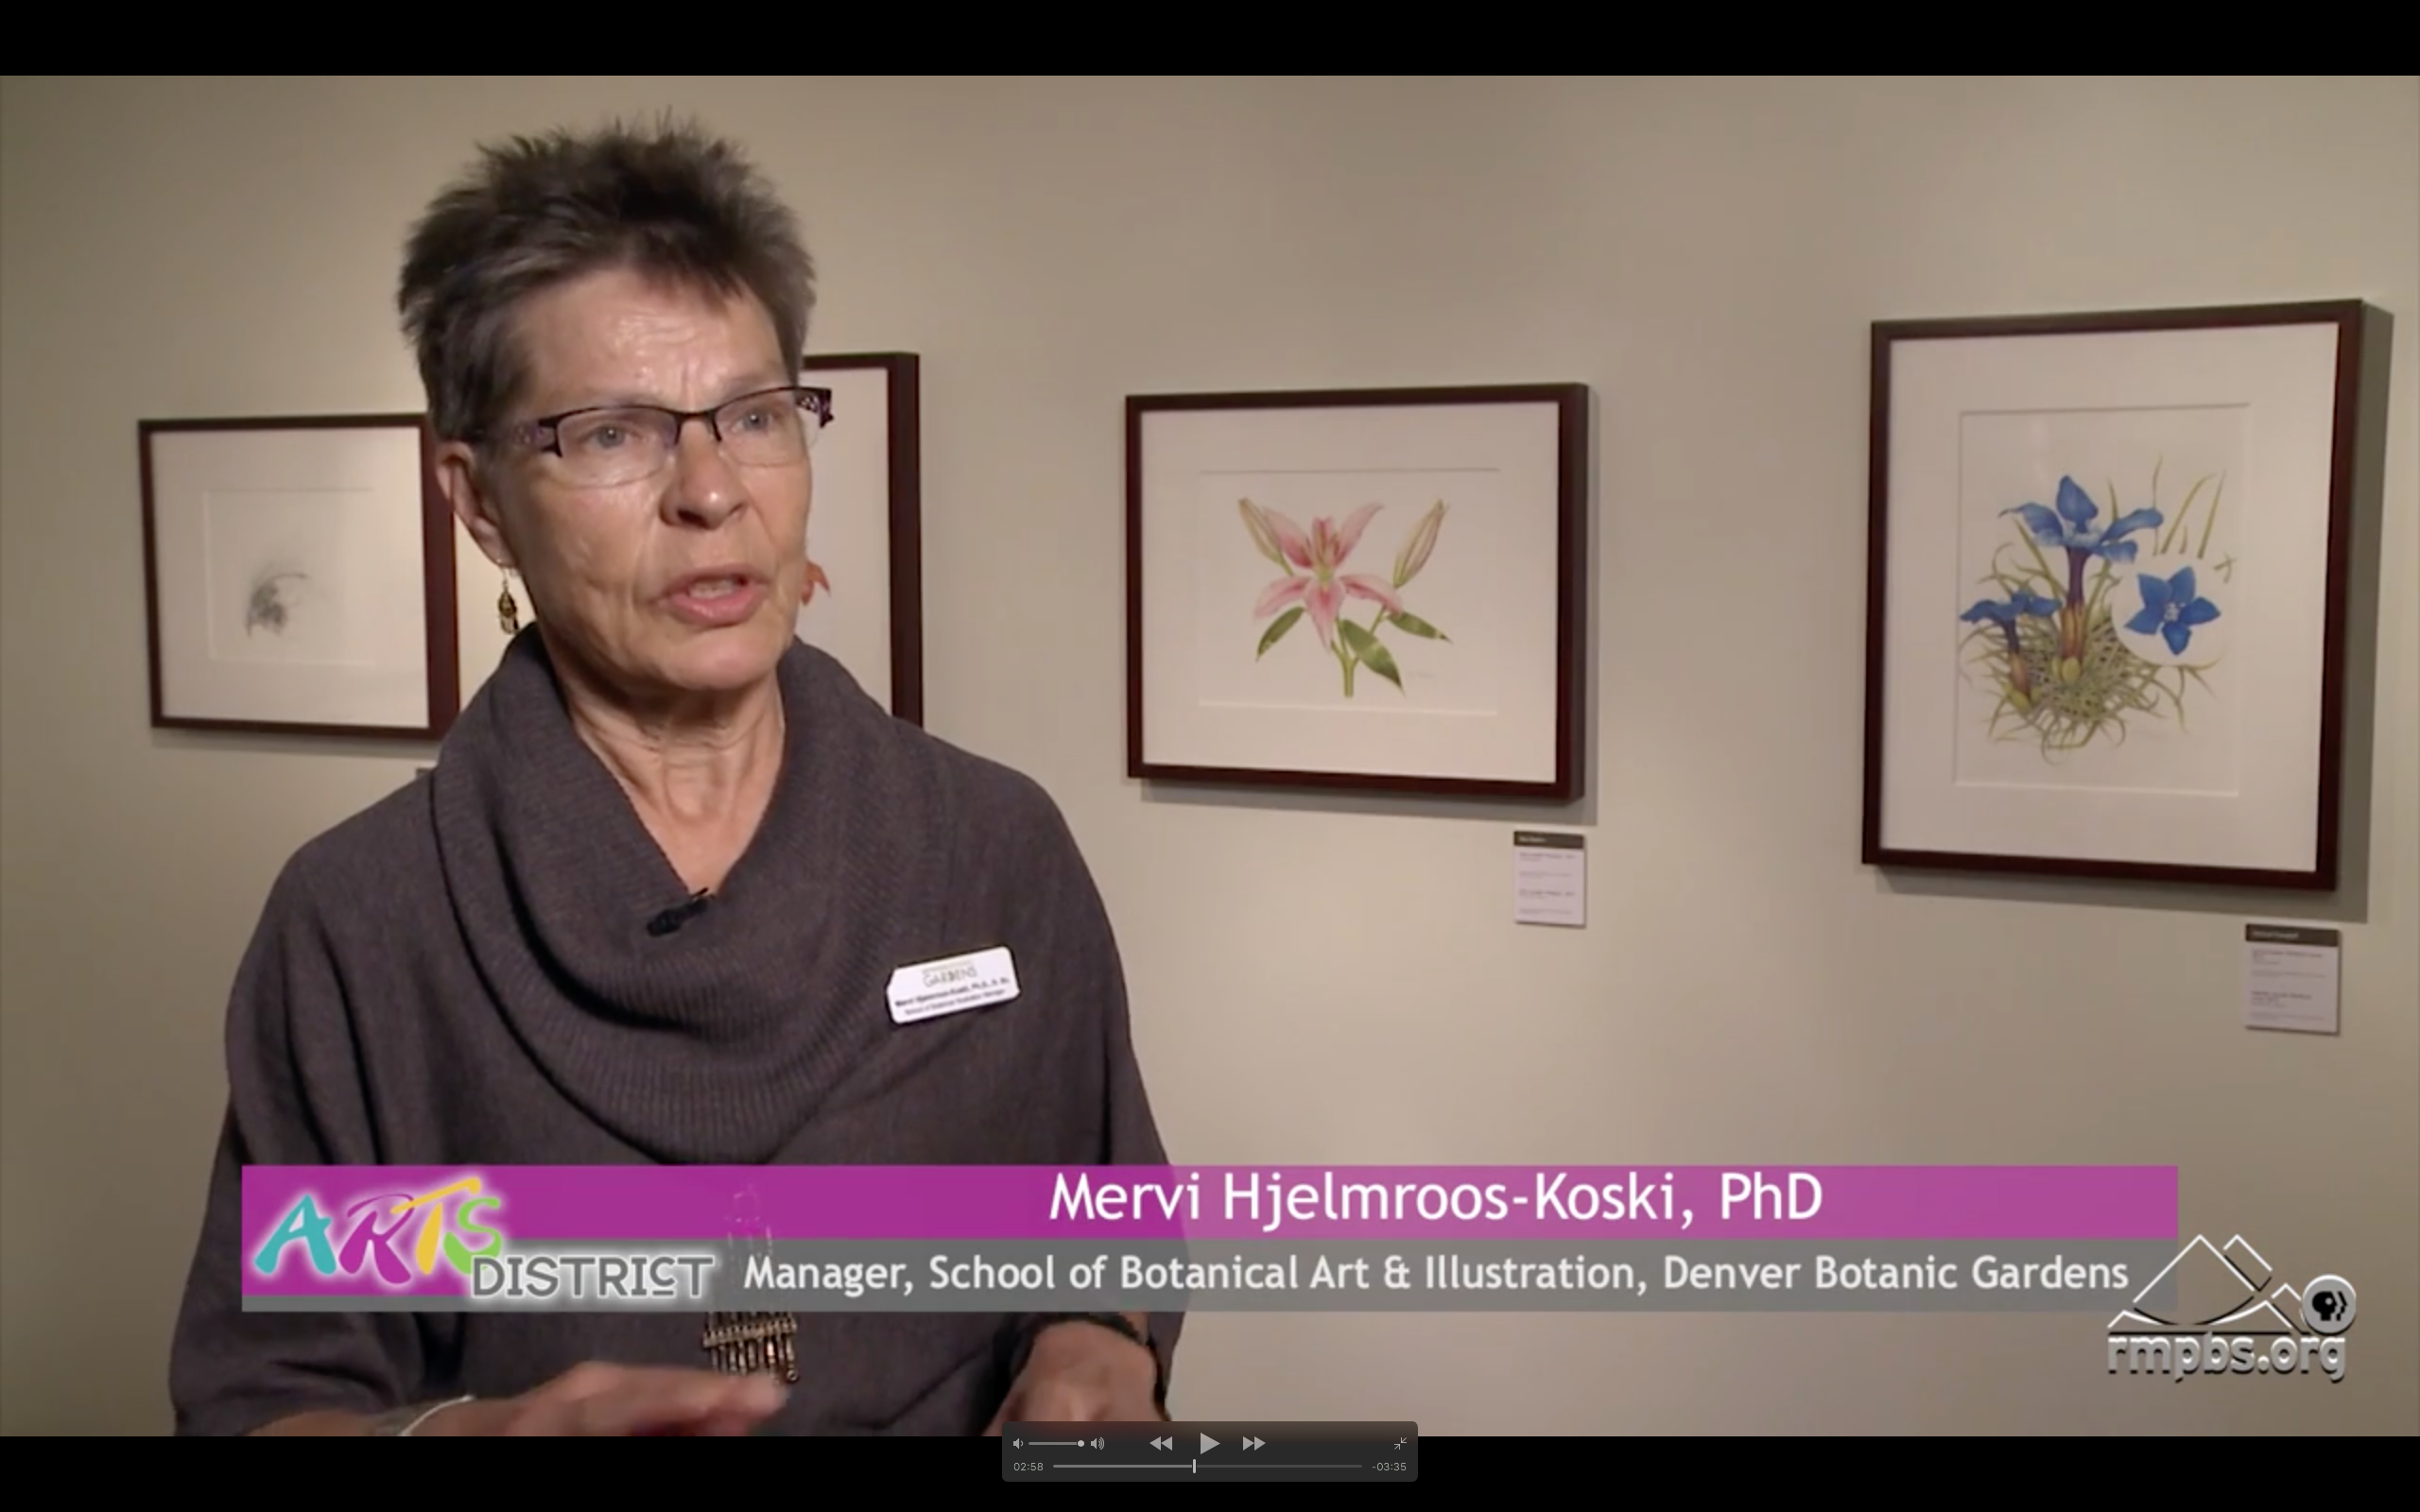 Mervi Hjelmroos-Koski, director of the School of Botanical Art and Illustration